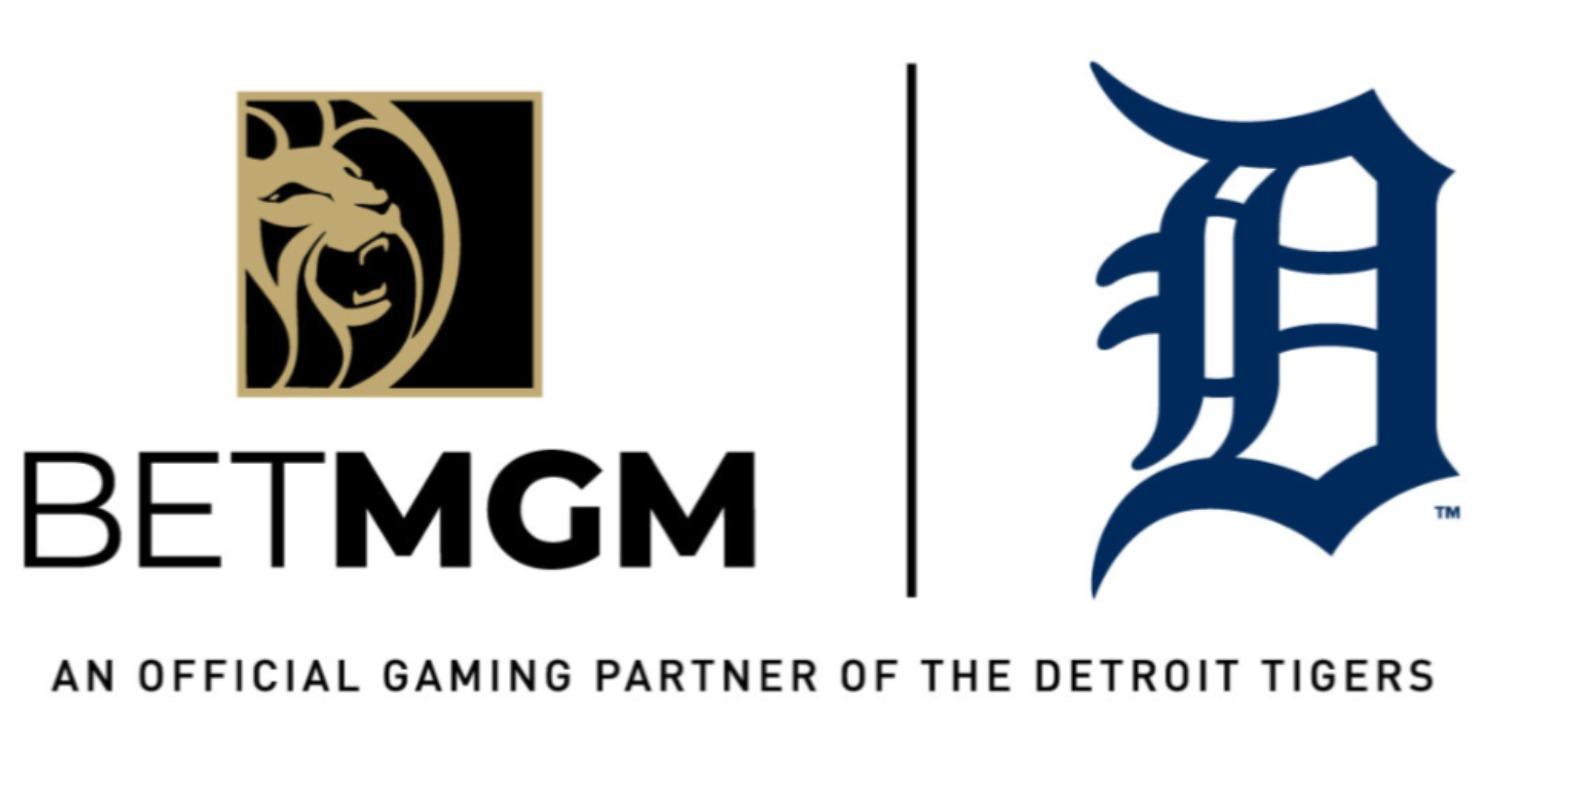 BetMGM and Detroit Tigers